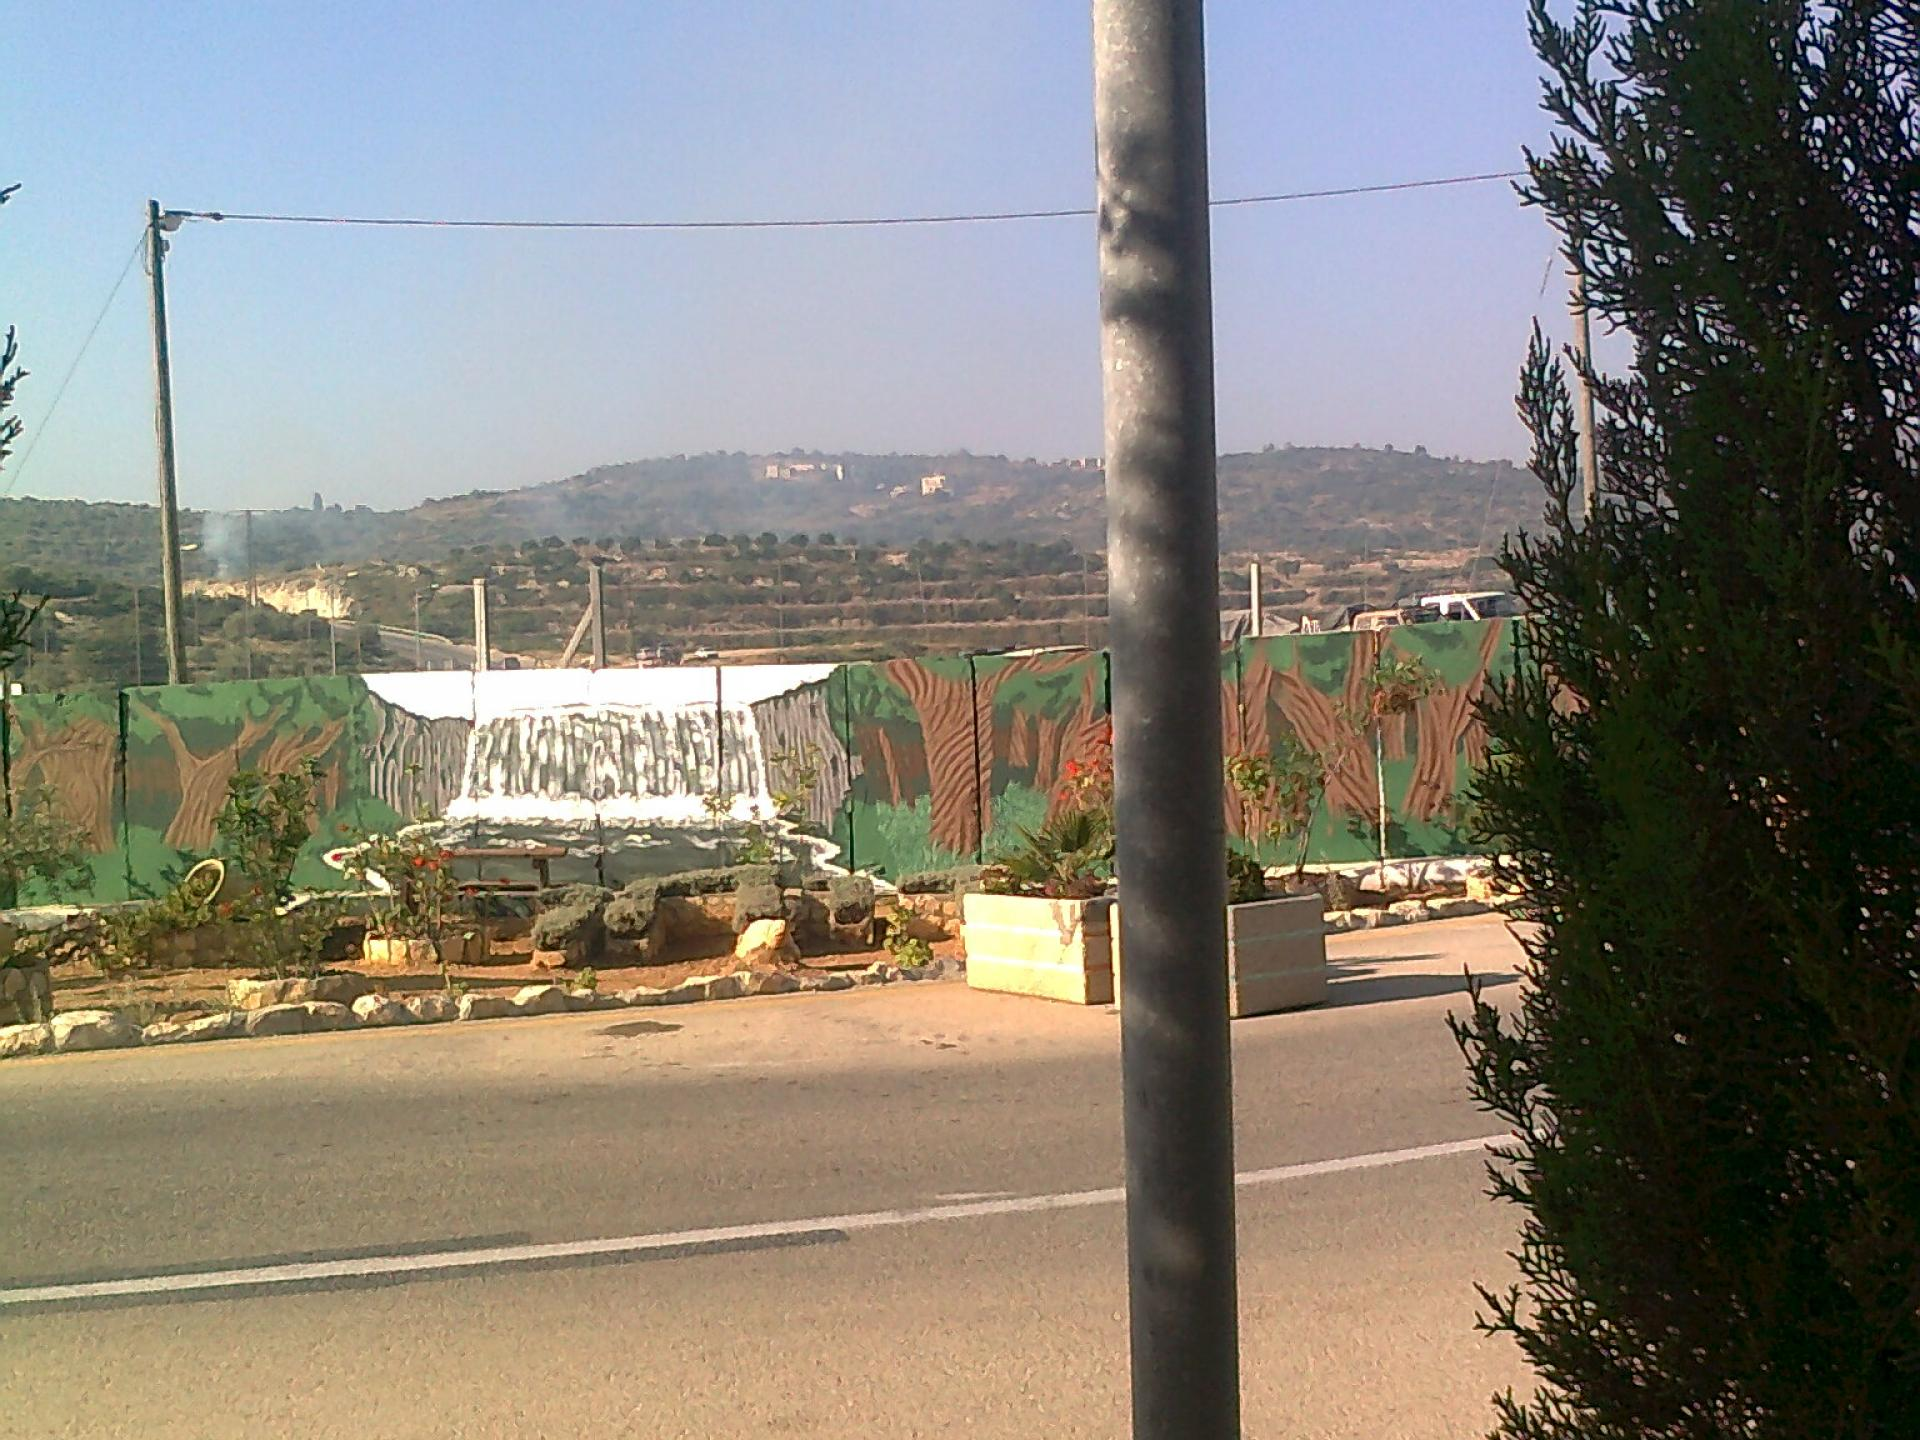 Barta'a/Reikhan checkpoint 12.05.12